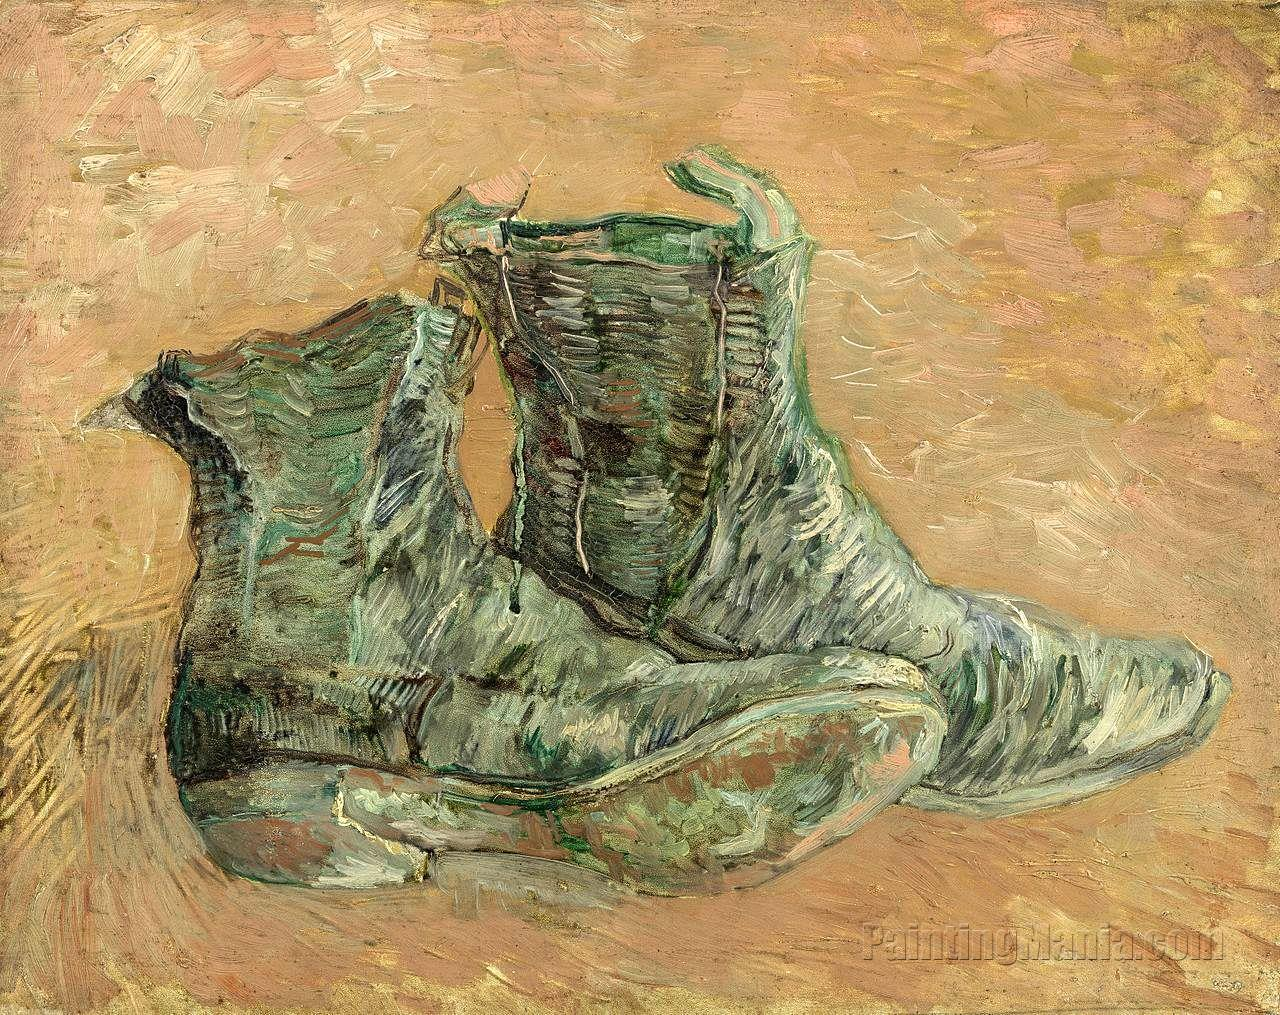 A Pair of Shoes 1886 - Vincent van Gogh